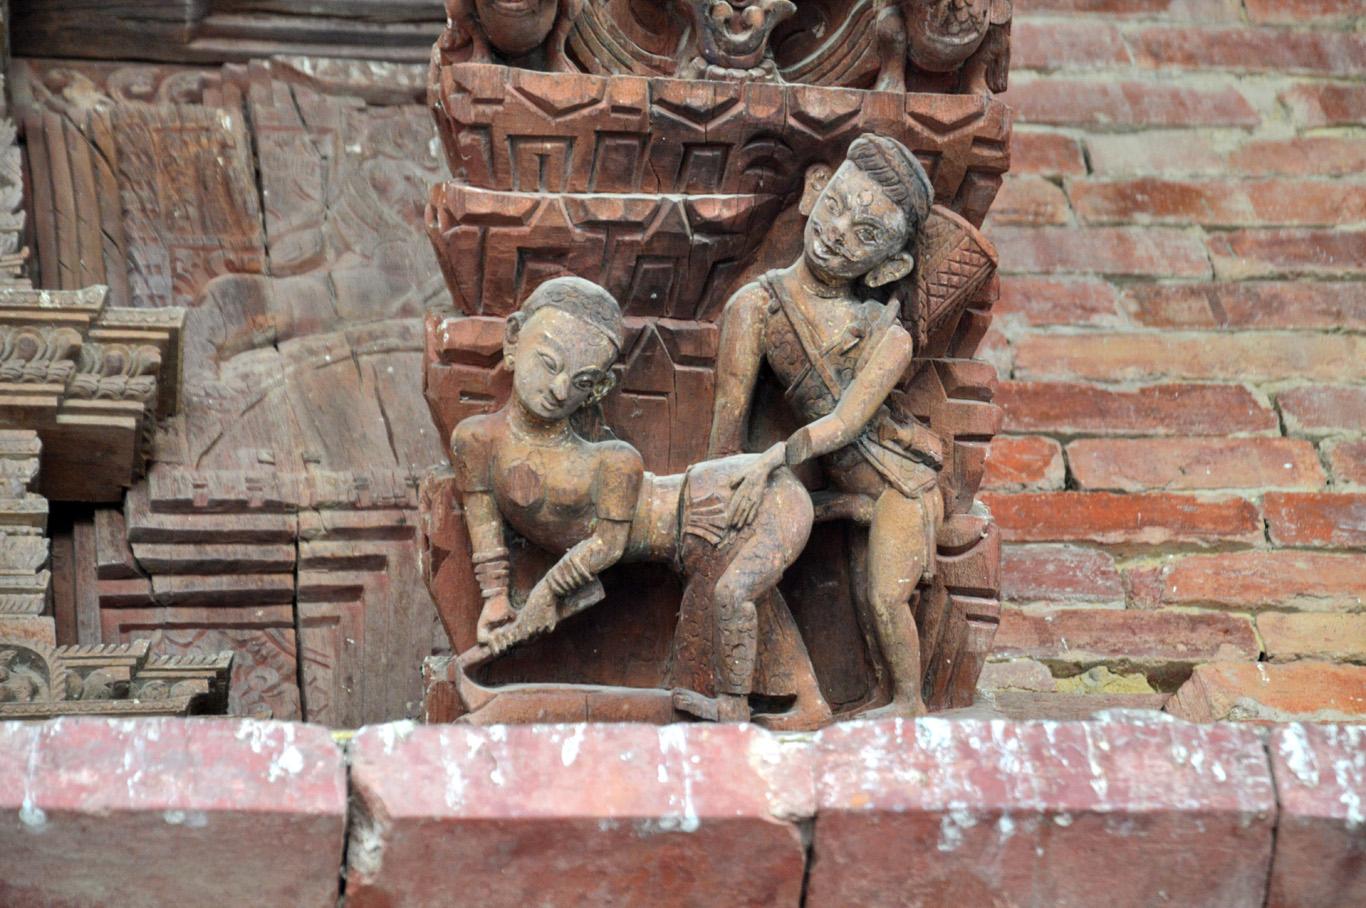 Camasutra reliefs